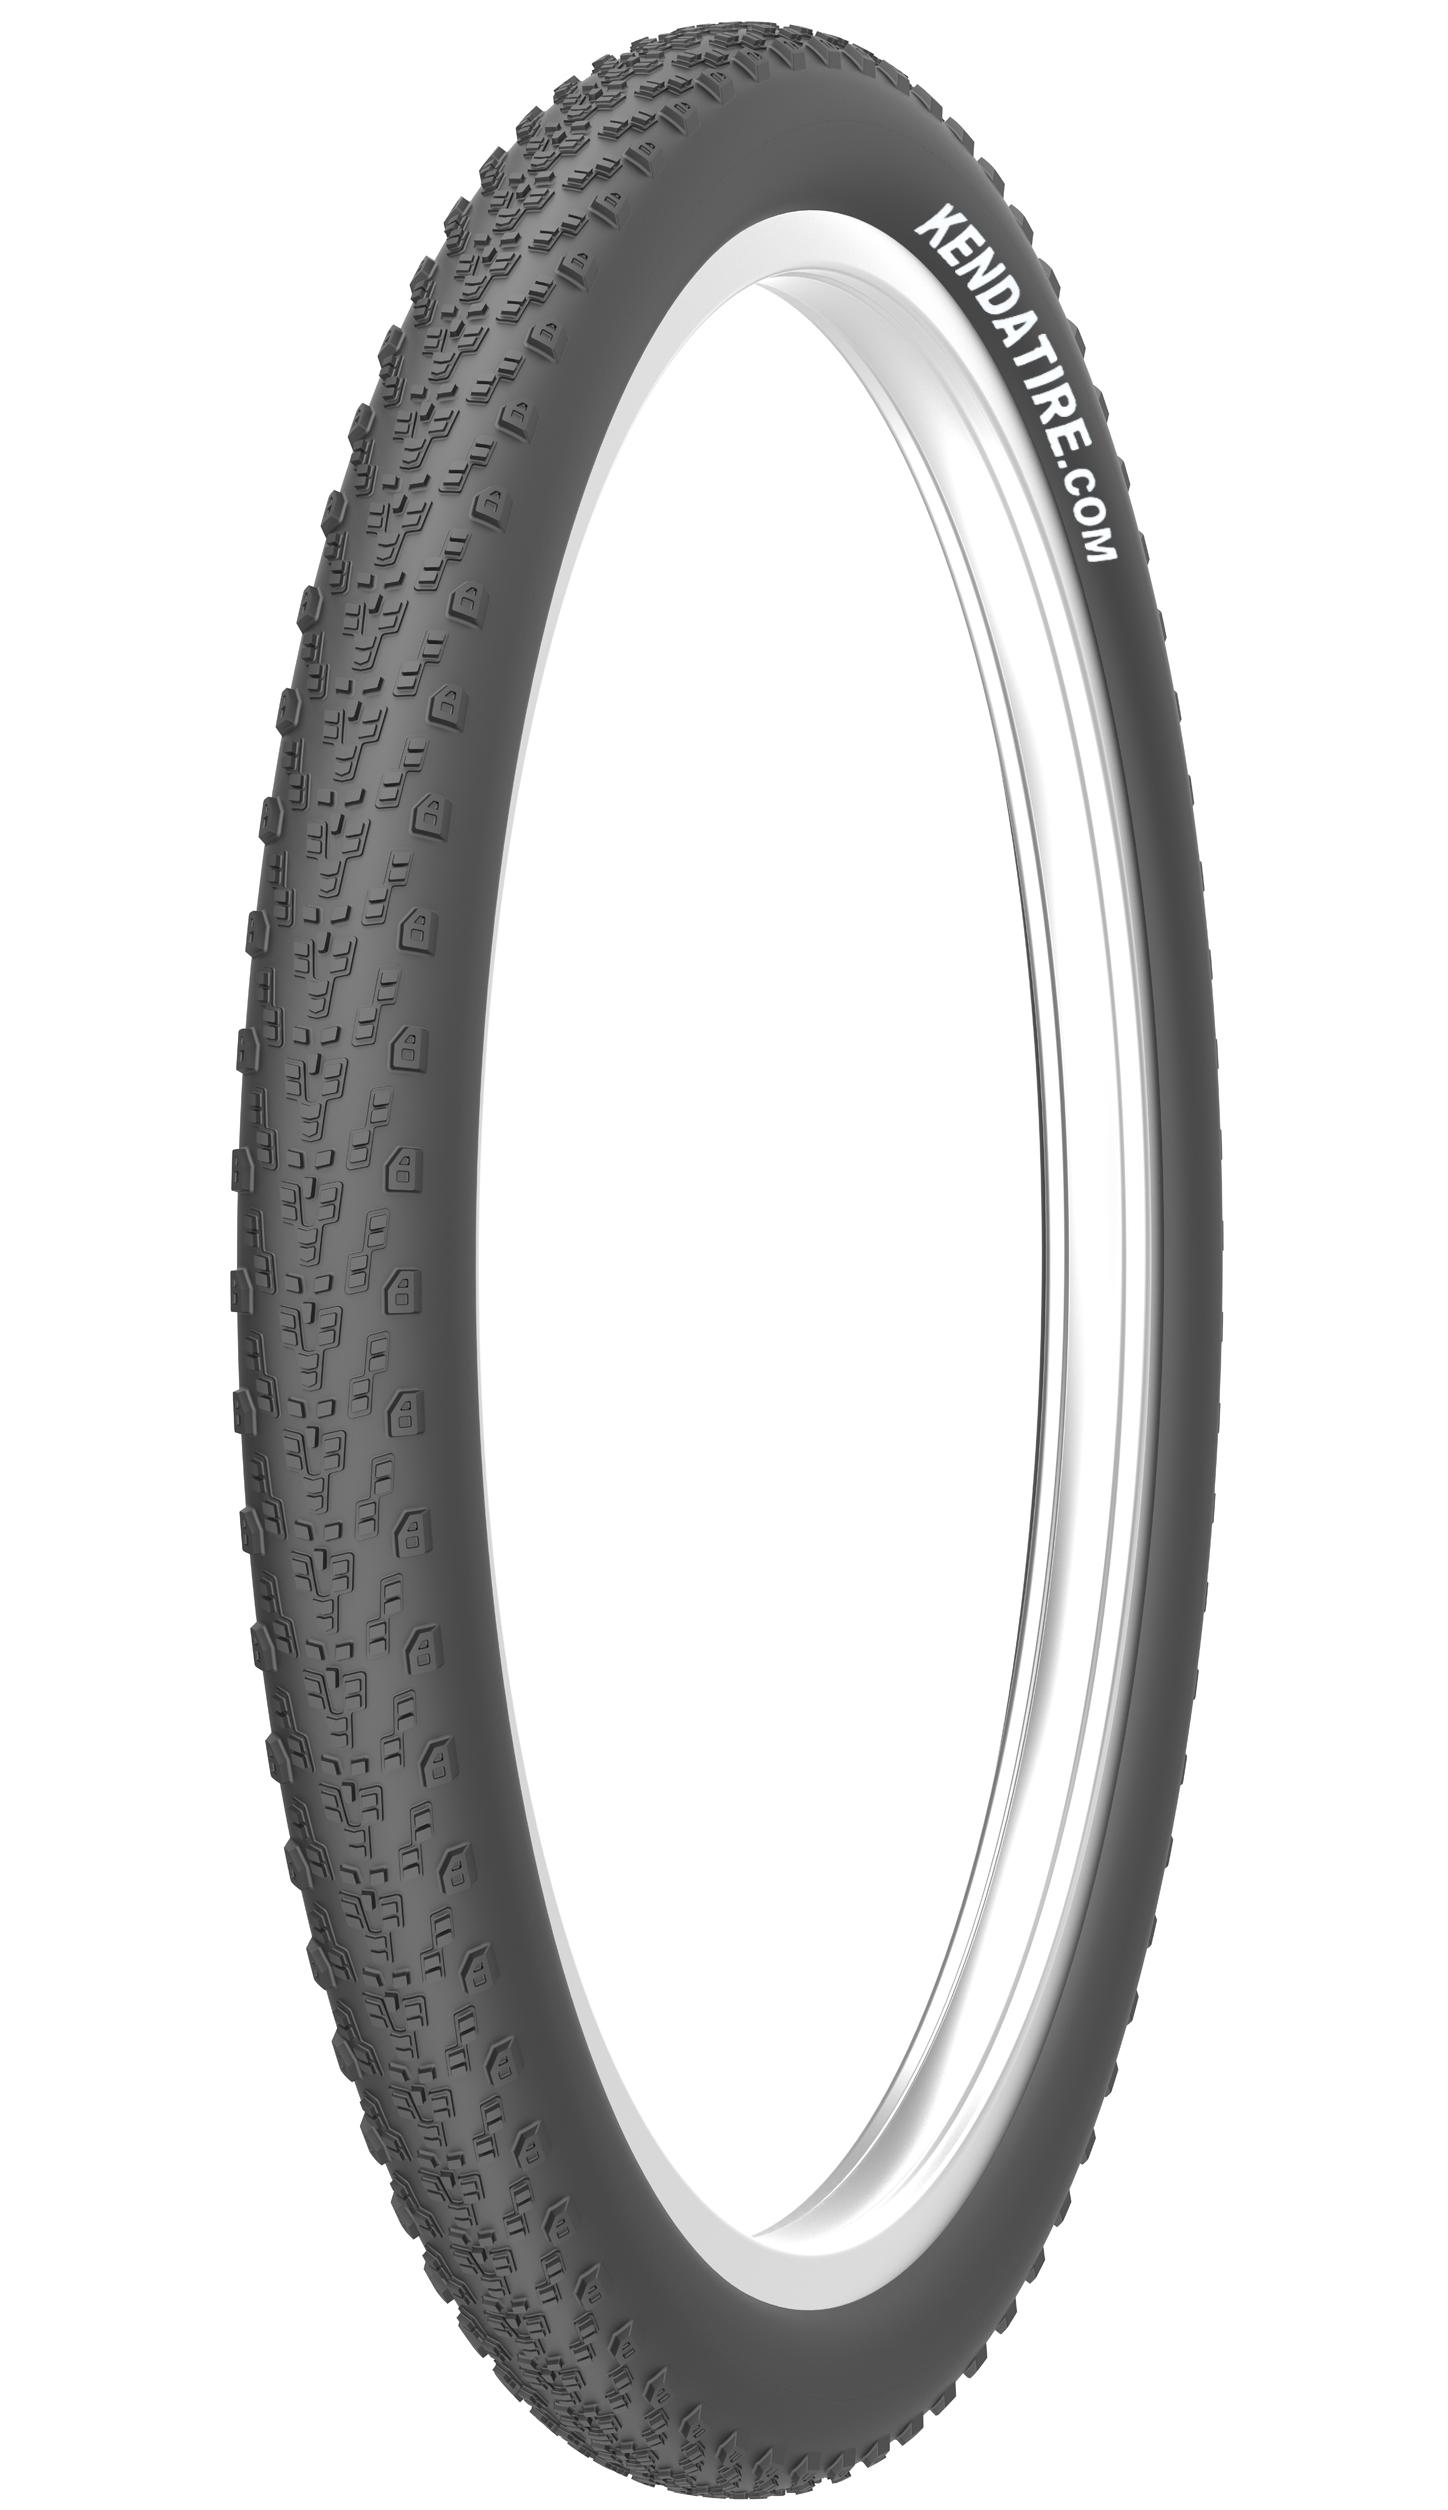 XC Mountain Bike Tire